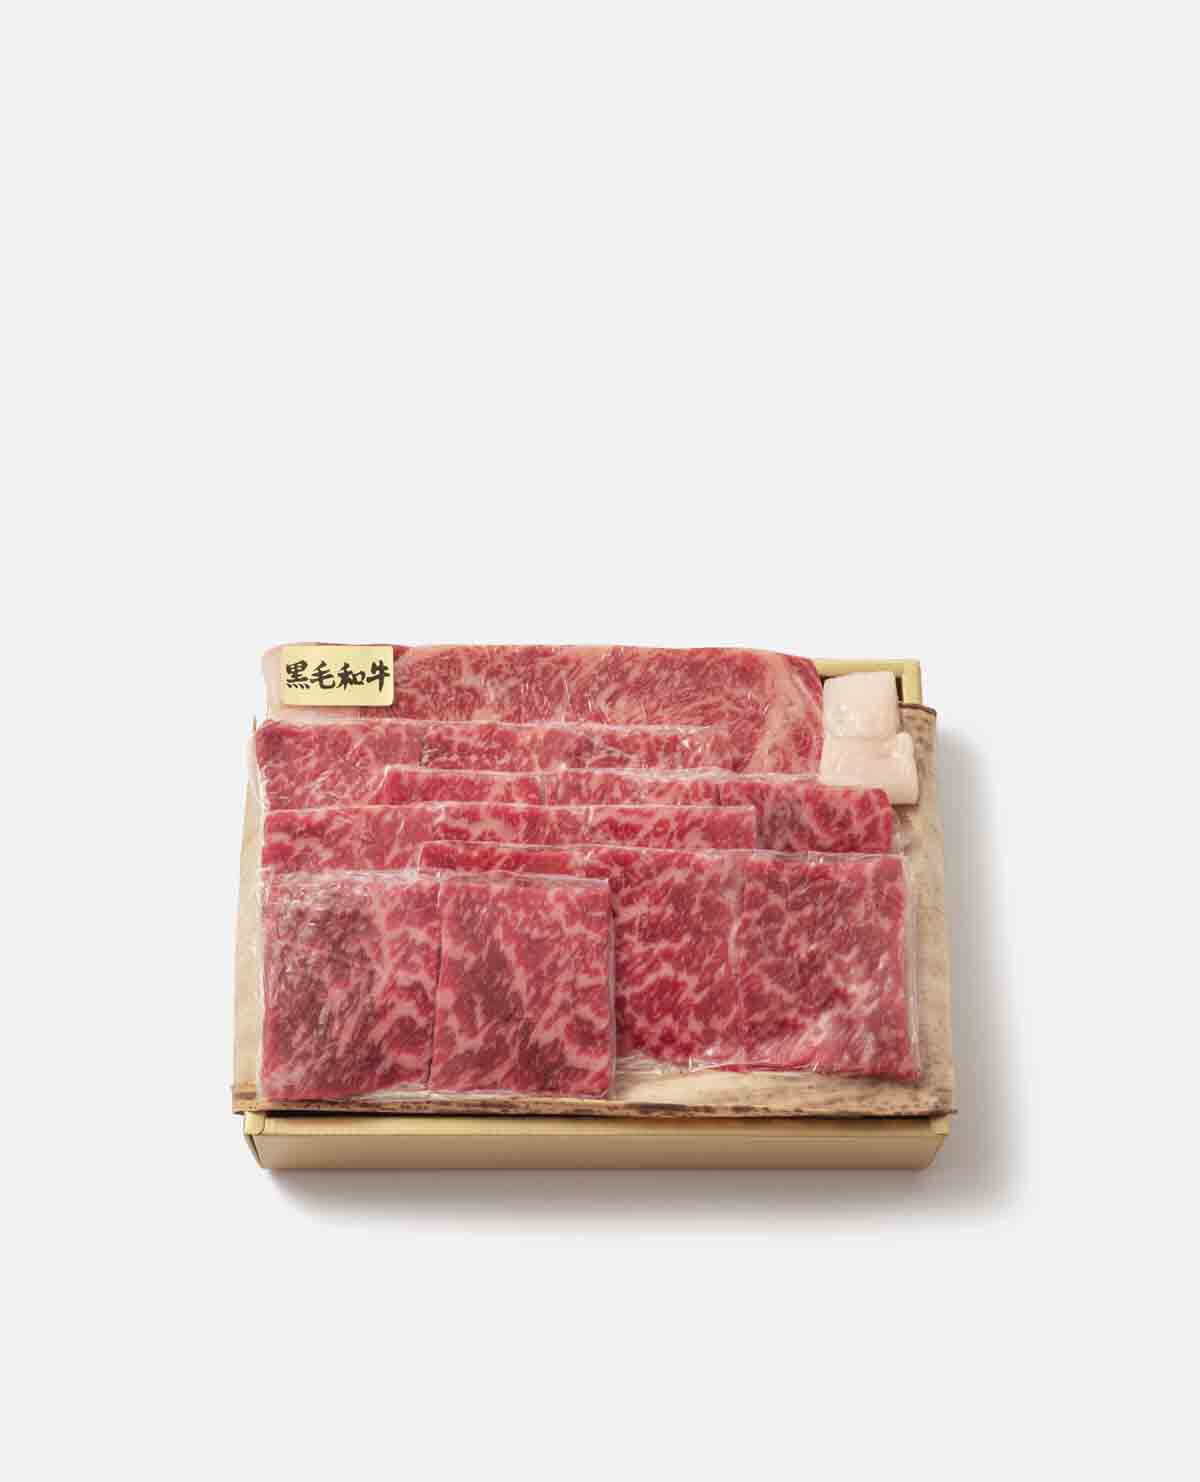 国内産黒毛和牛ステーキ用・焼肉用詰合せ